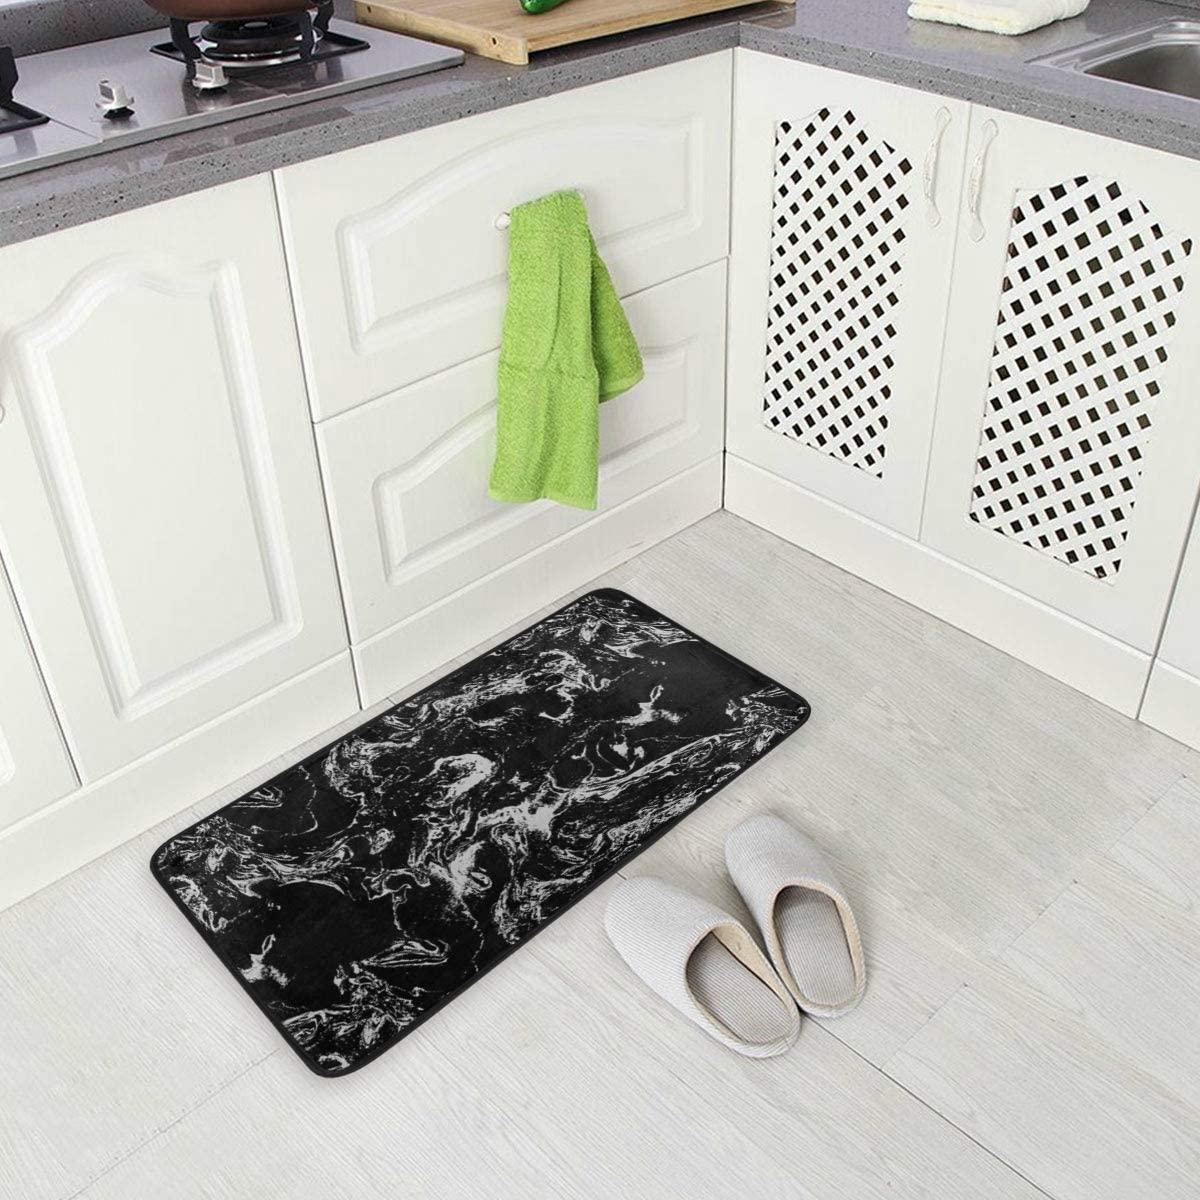 Kitchen Rugs Vintage Marble Non-Slip Kitchen Mats Bath Runner Rug Doormats Area Mat Rugs Carpet for Home Decor 39